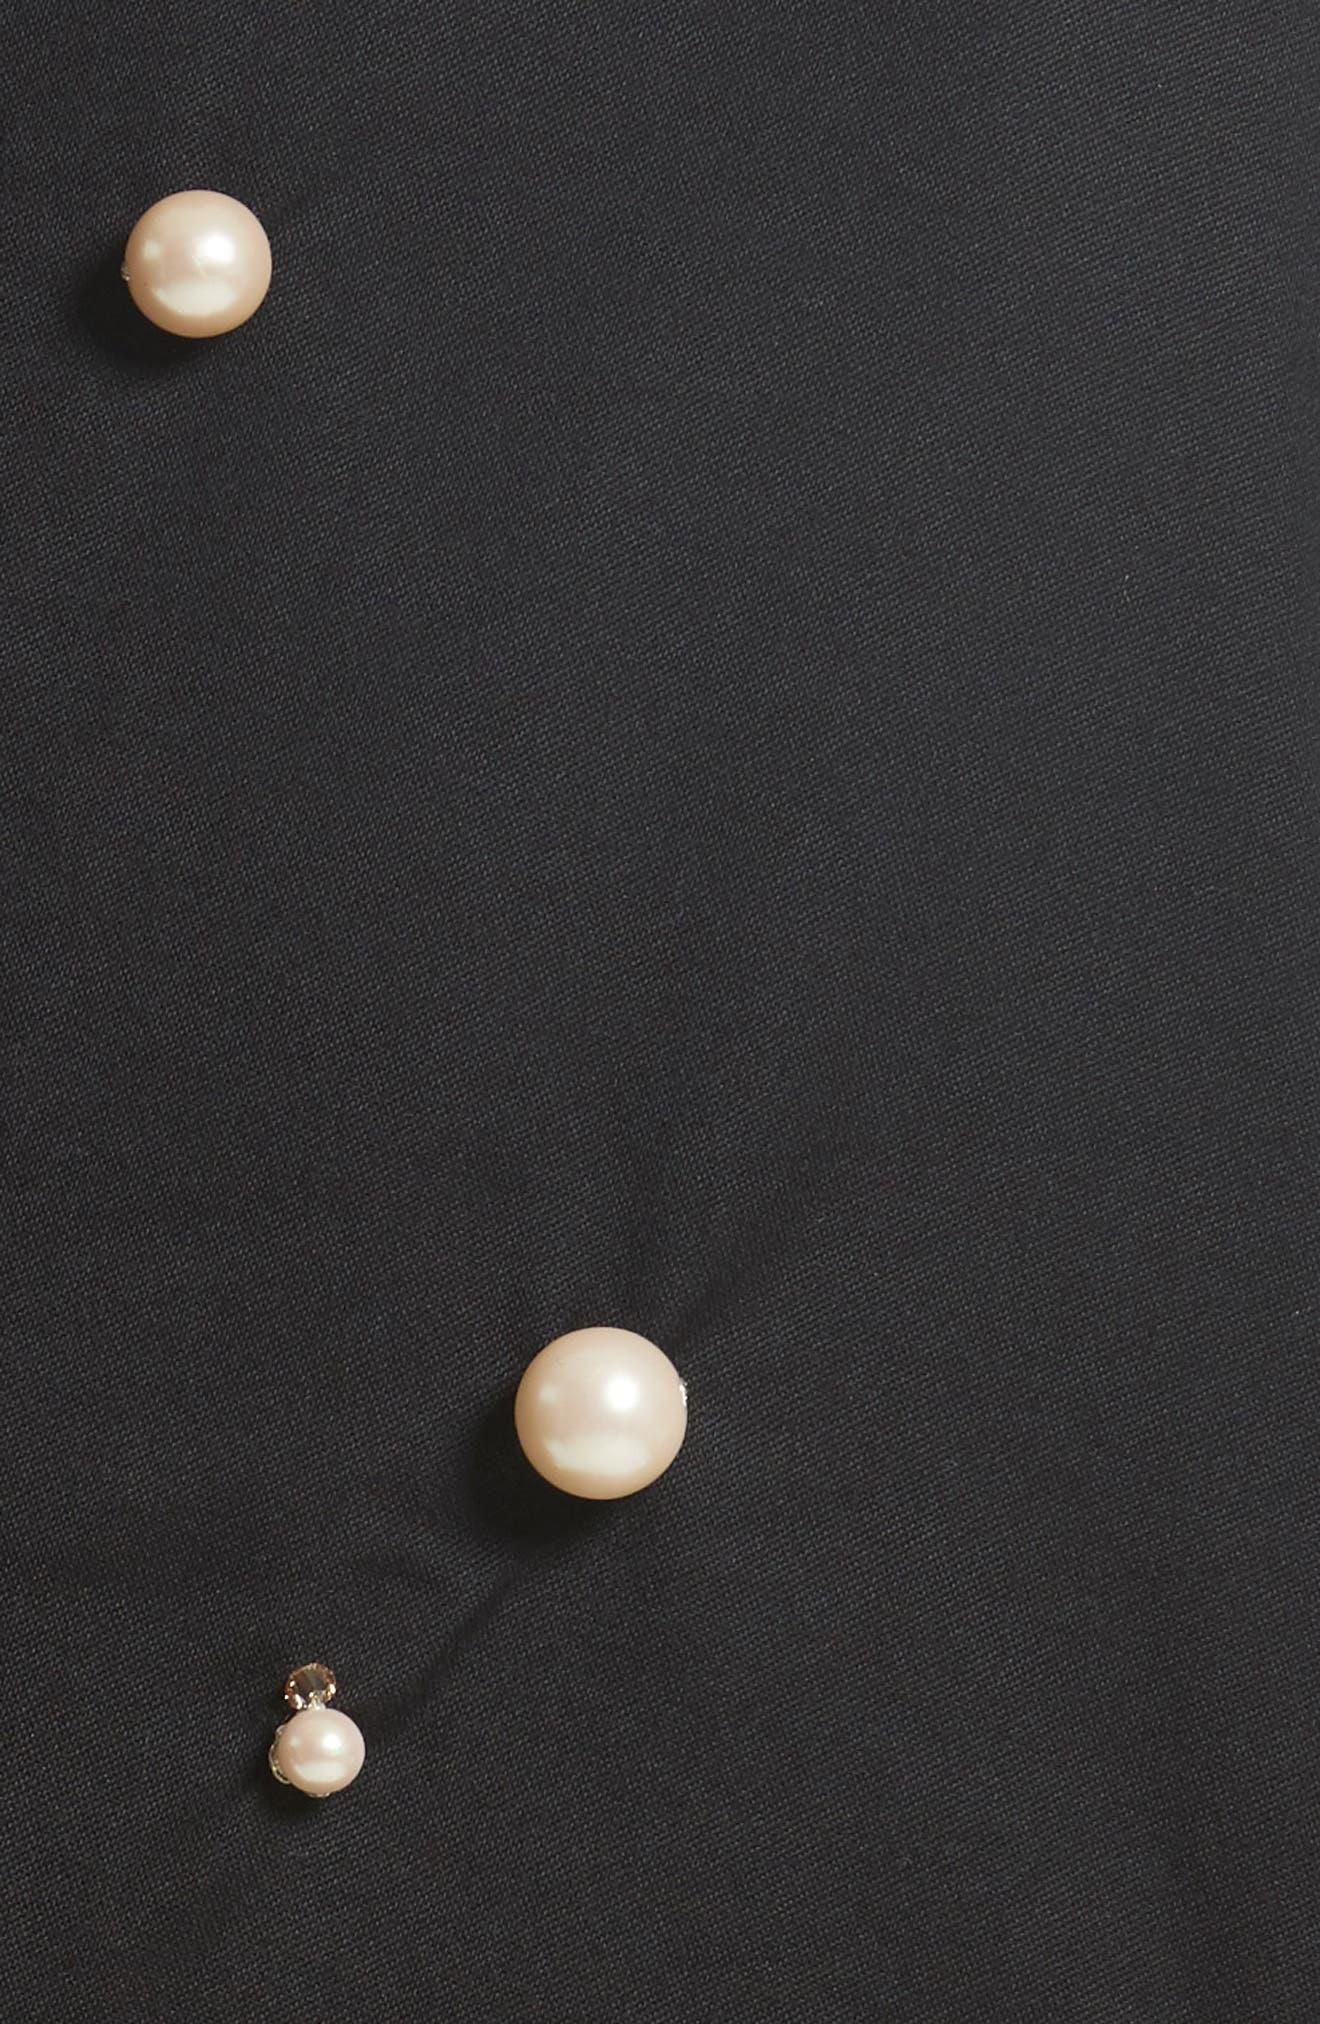 Snow Imitation Pearl Embellished Field Jacket,                             Alternate thumbnail 5, color,                             Black